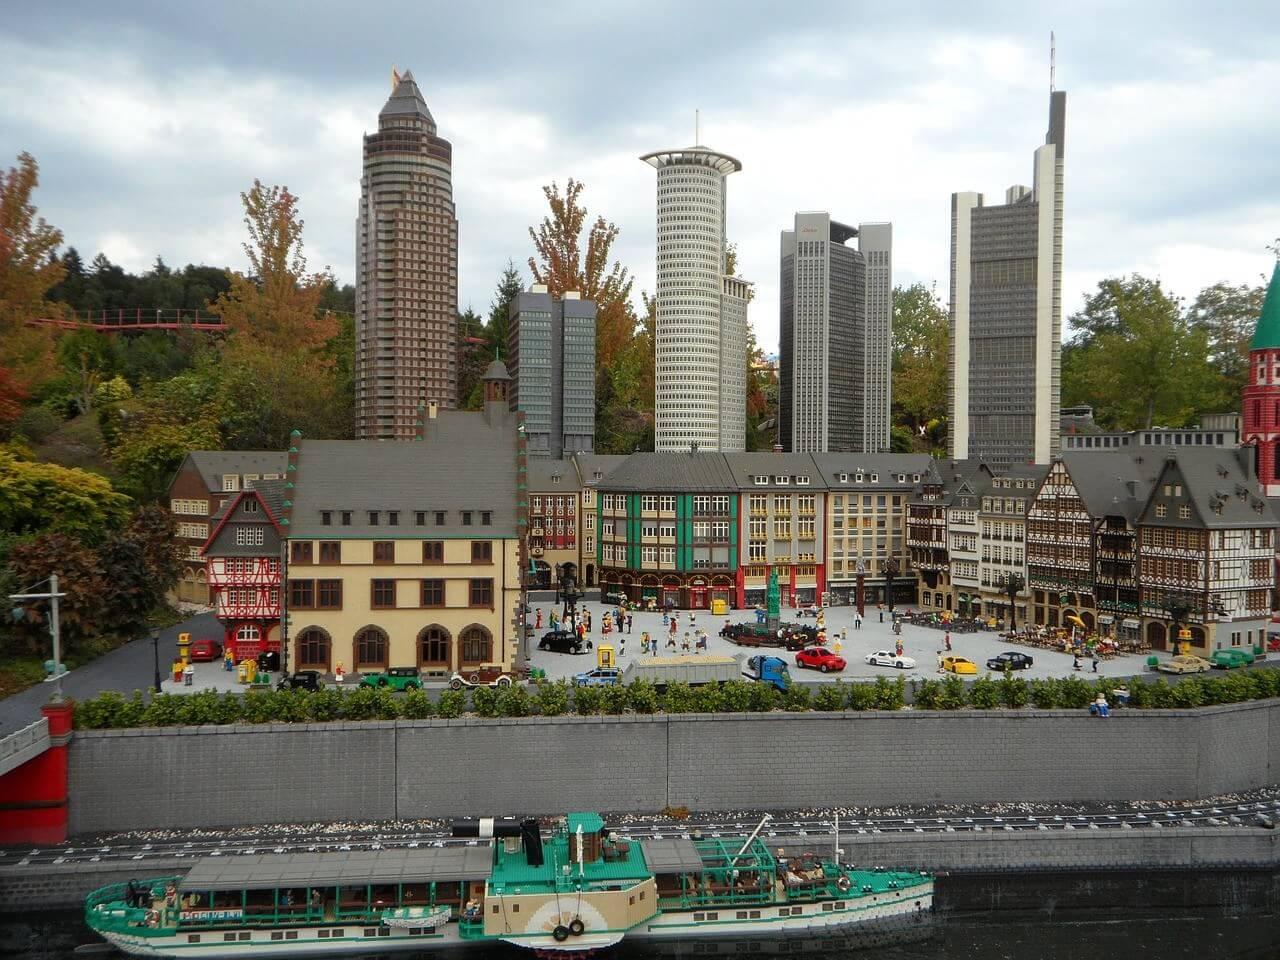 frankfurt au Legoland Deutschland